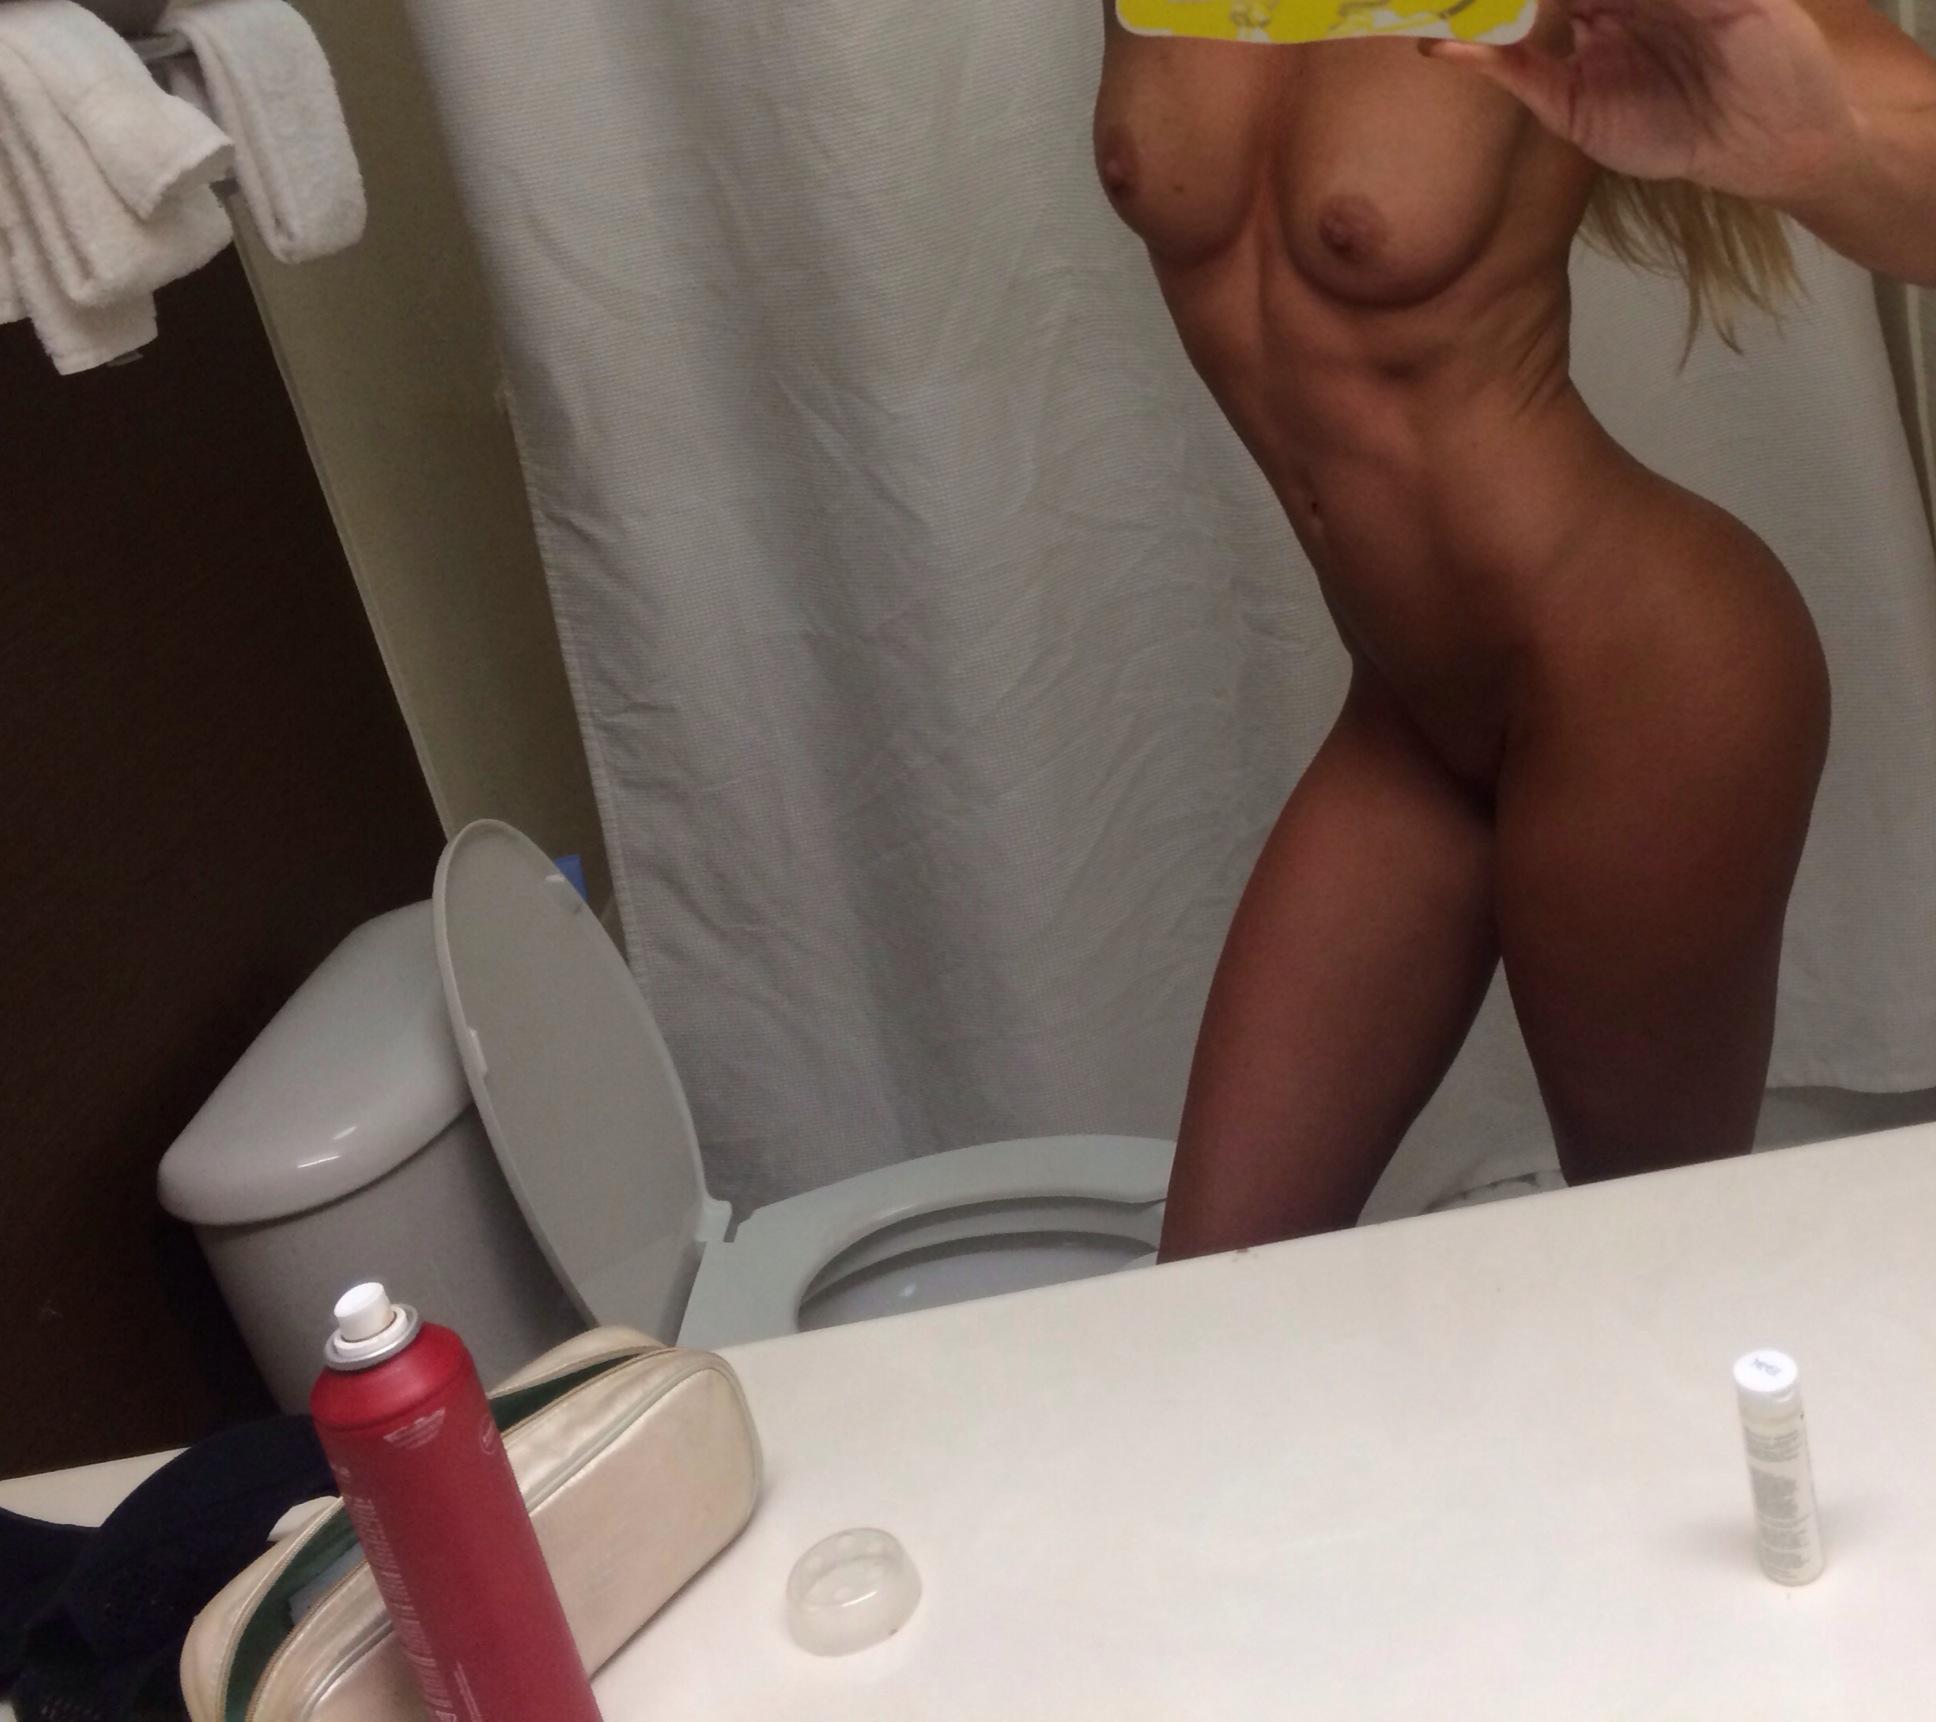 Danielle Wyatt Leaked Sex Photos